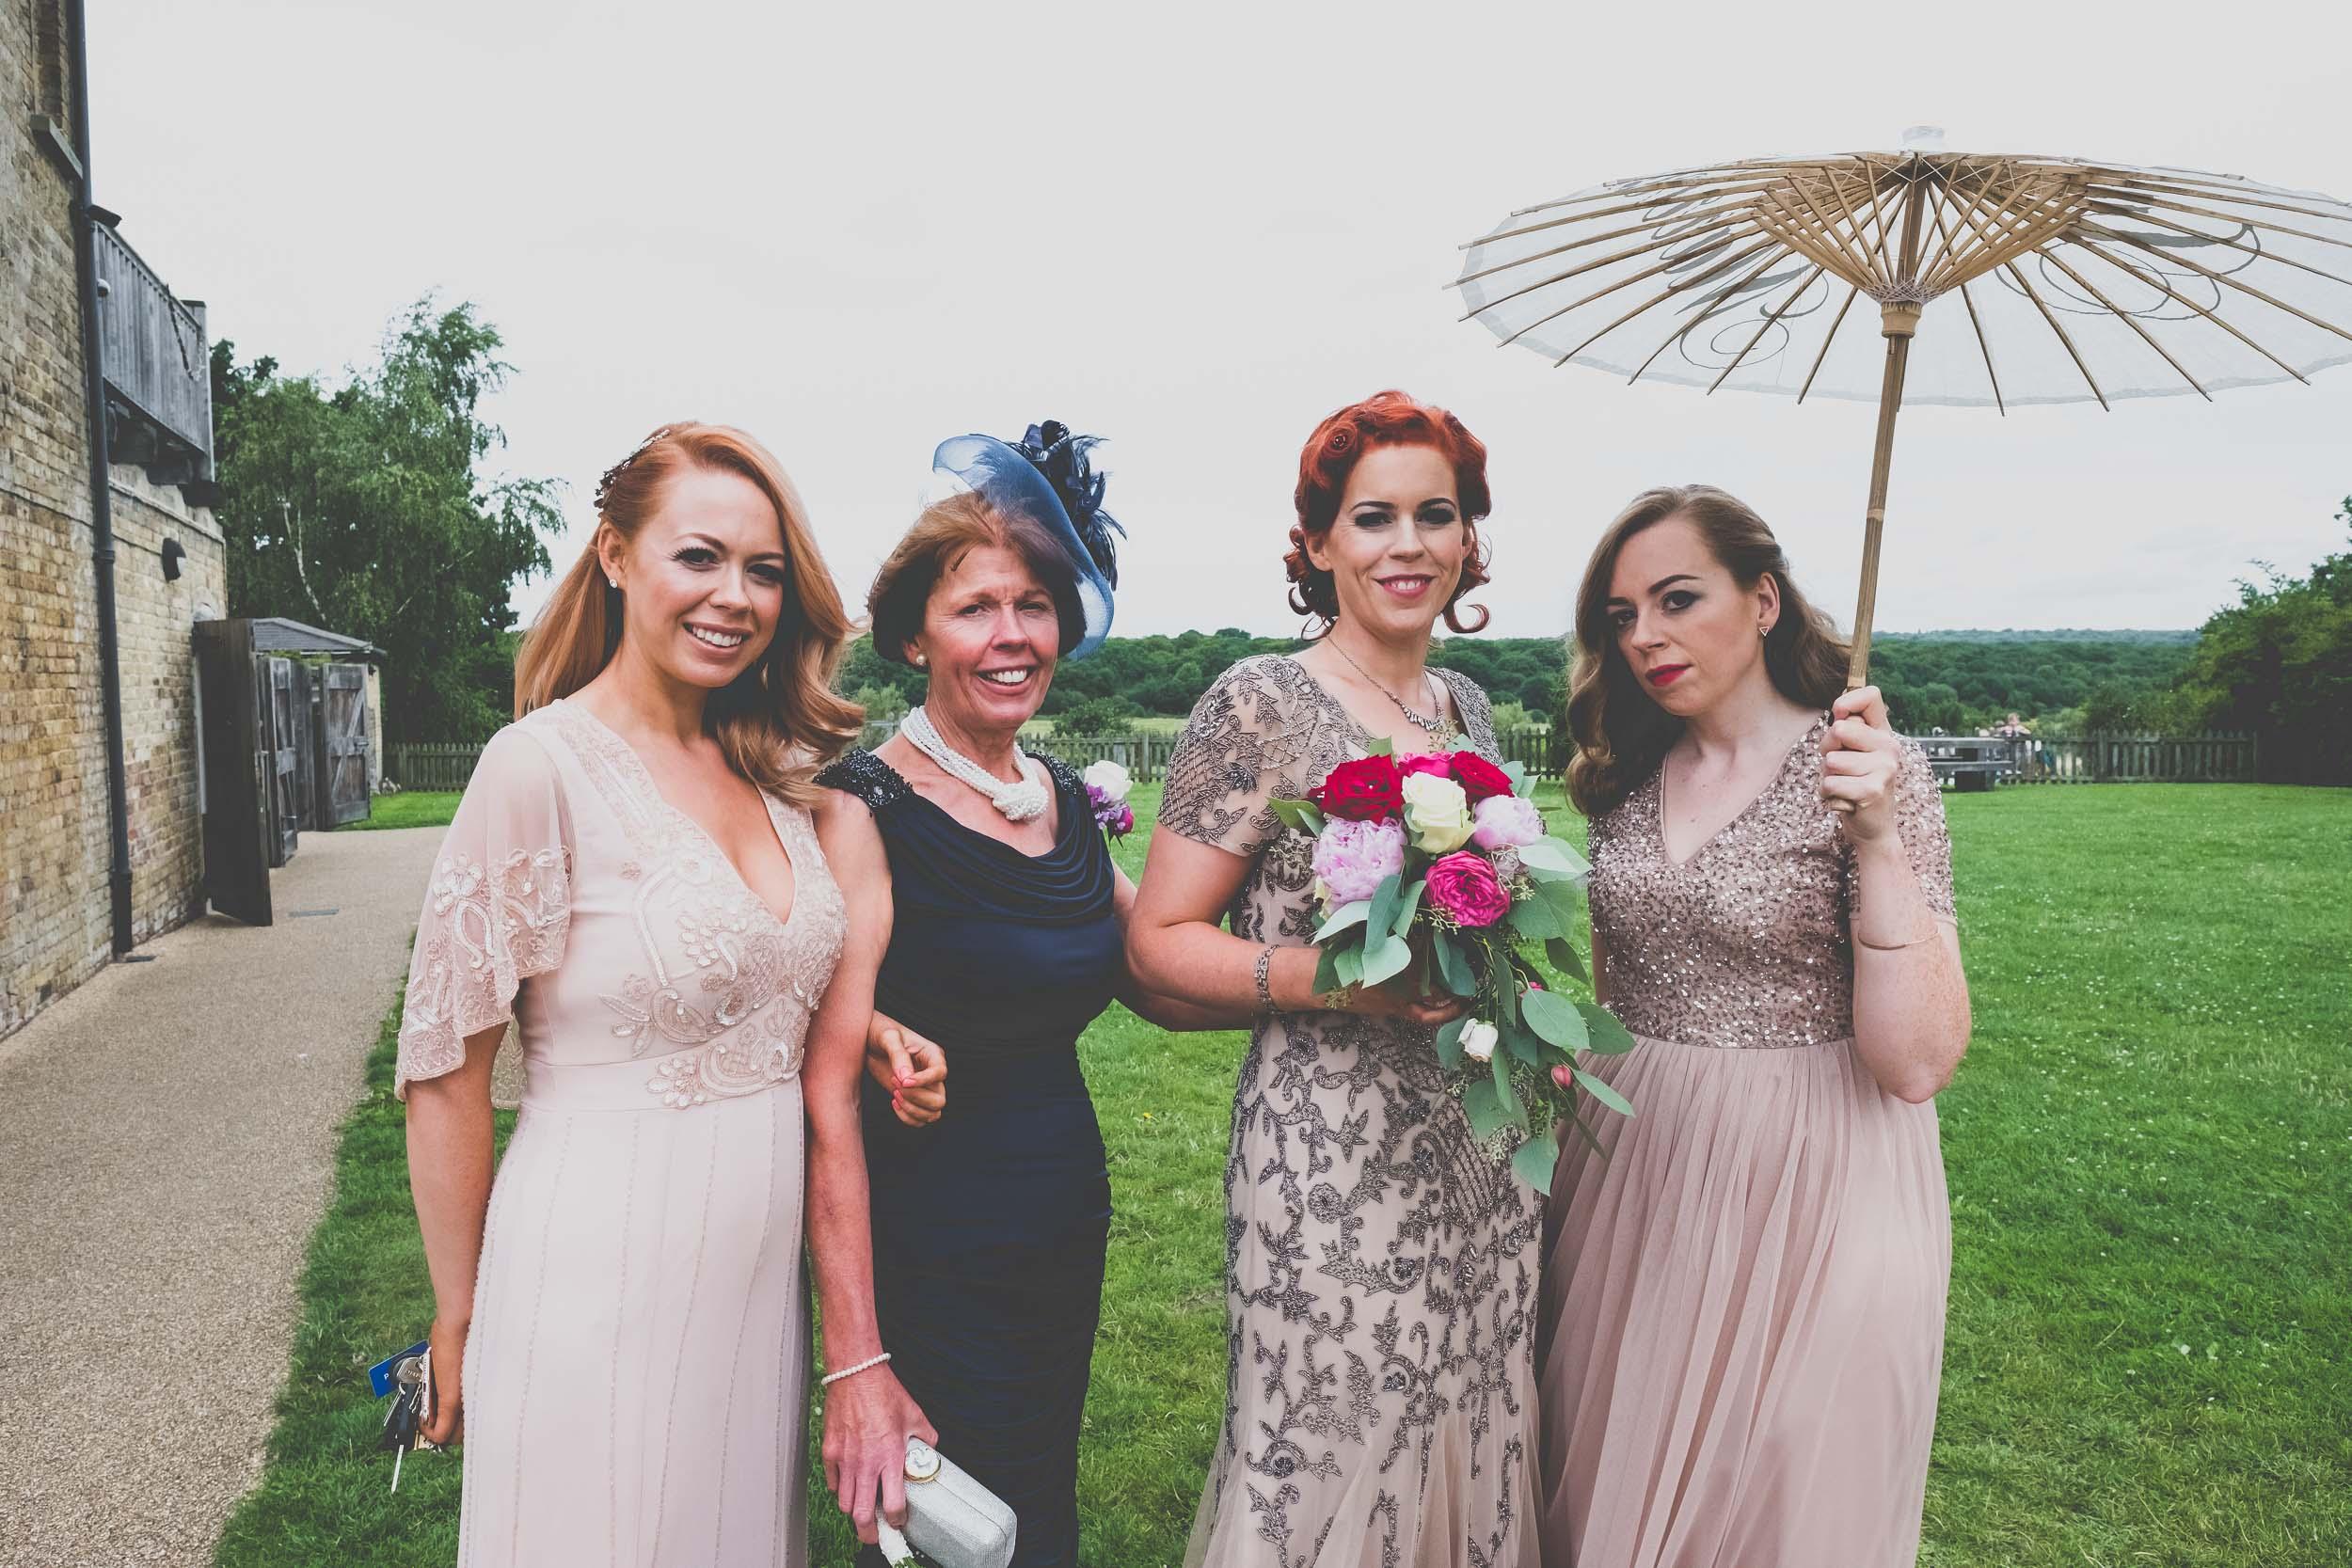 queen-elizabeths-hunting-lodge-epping-forest-wedding019.jpg